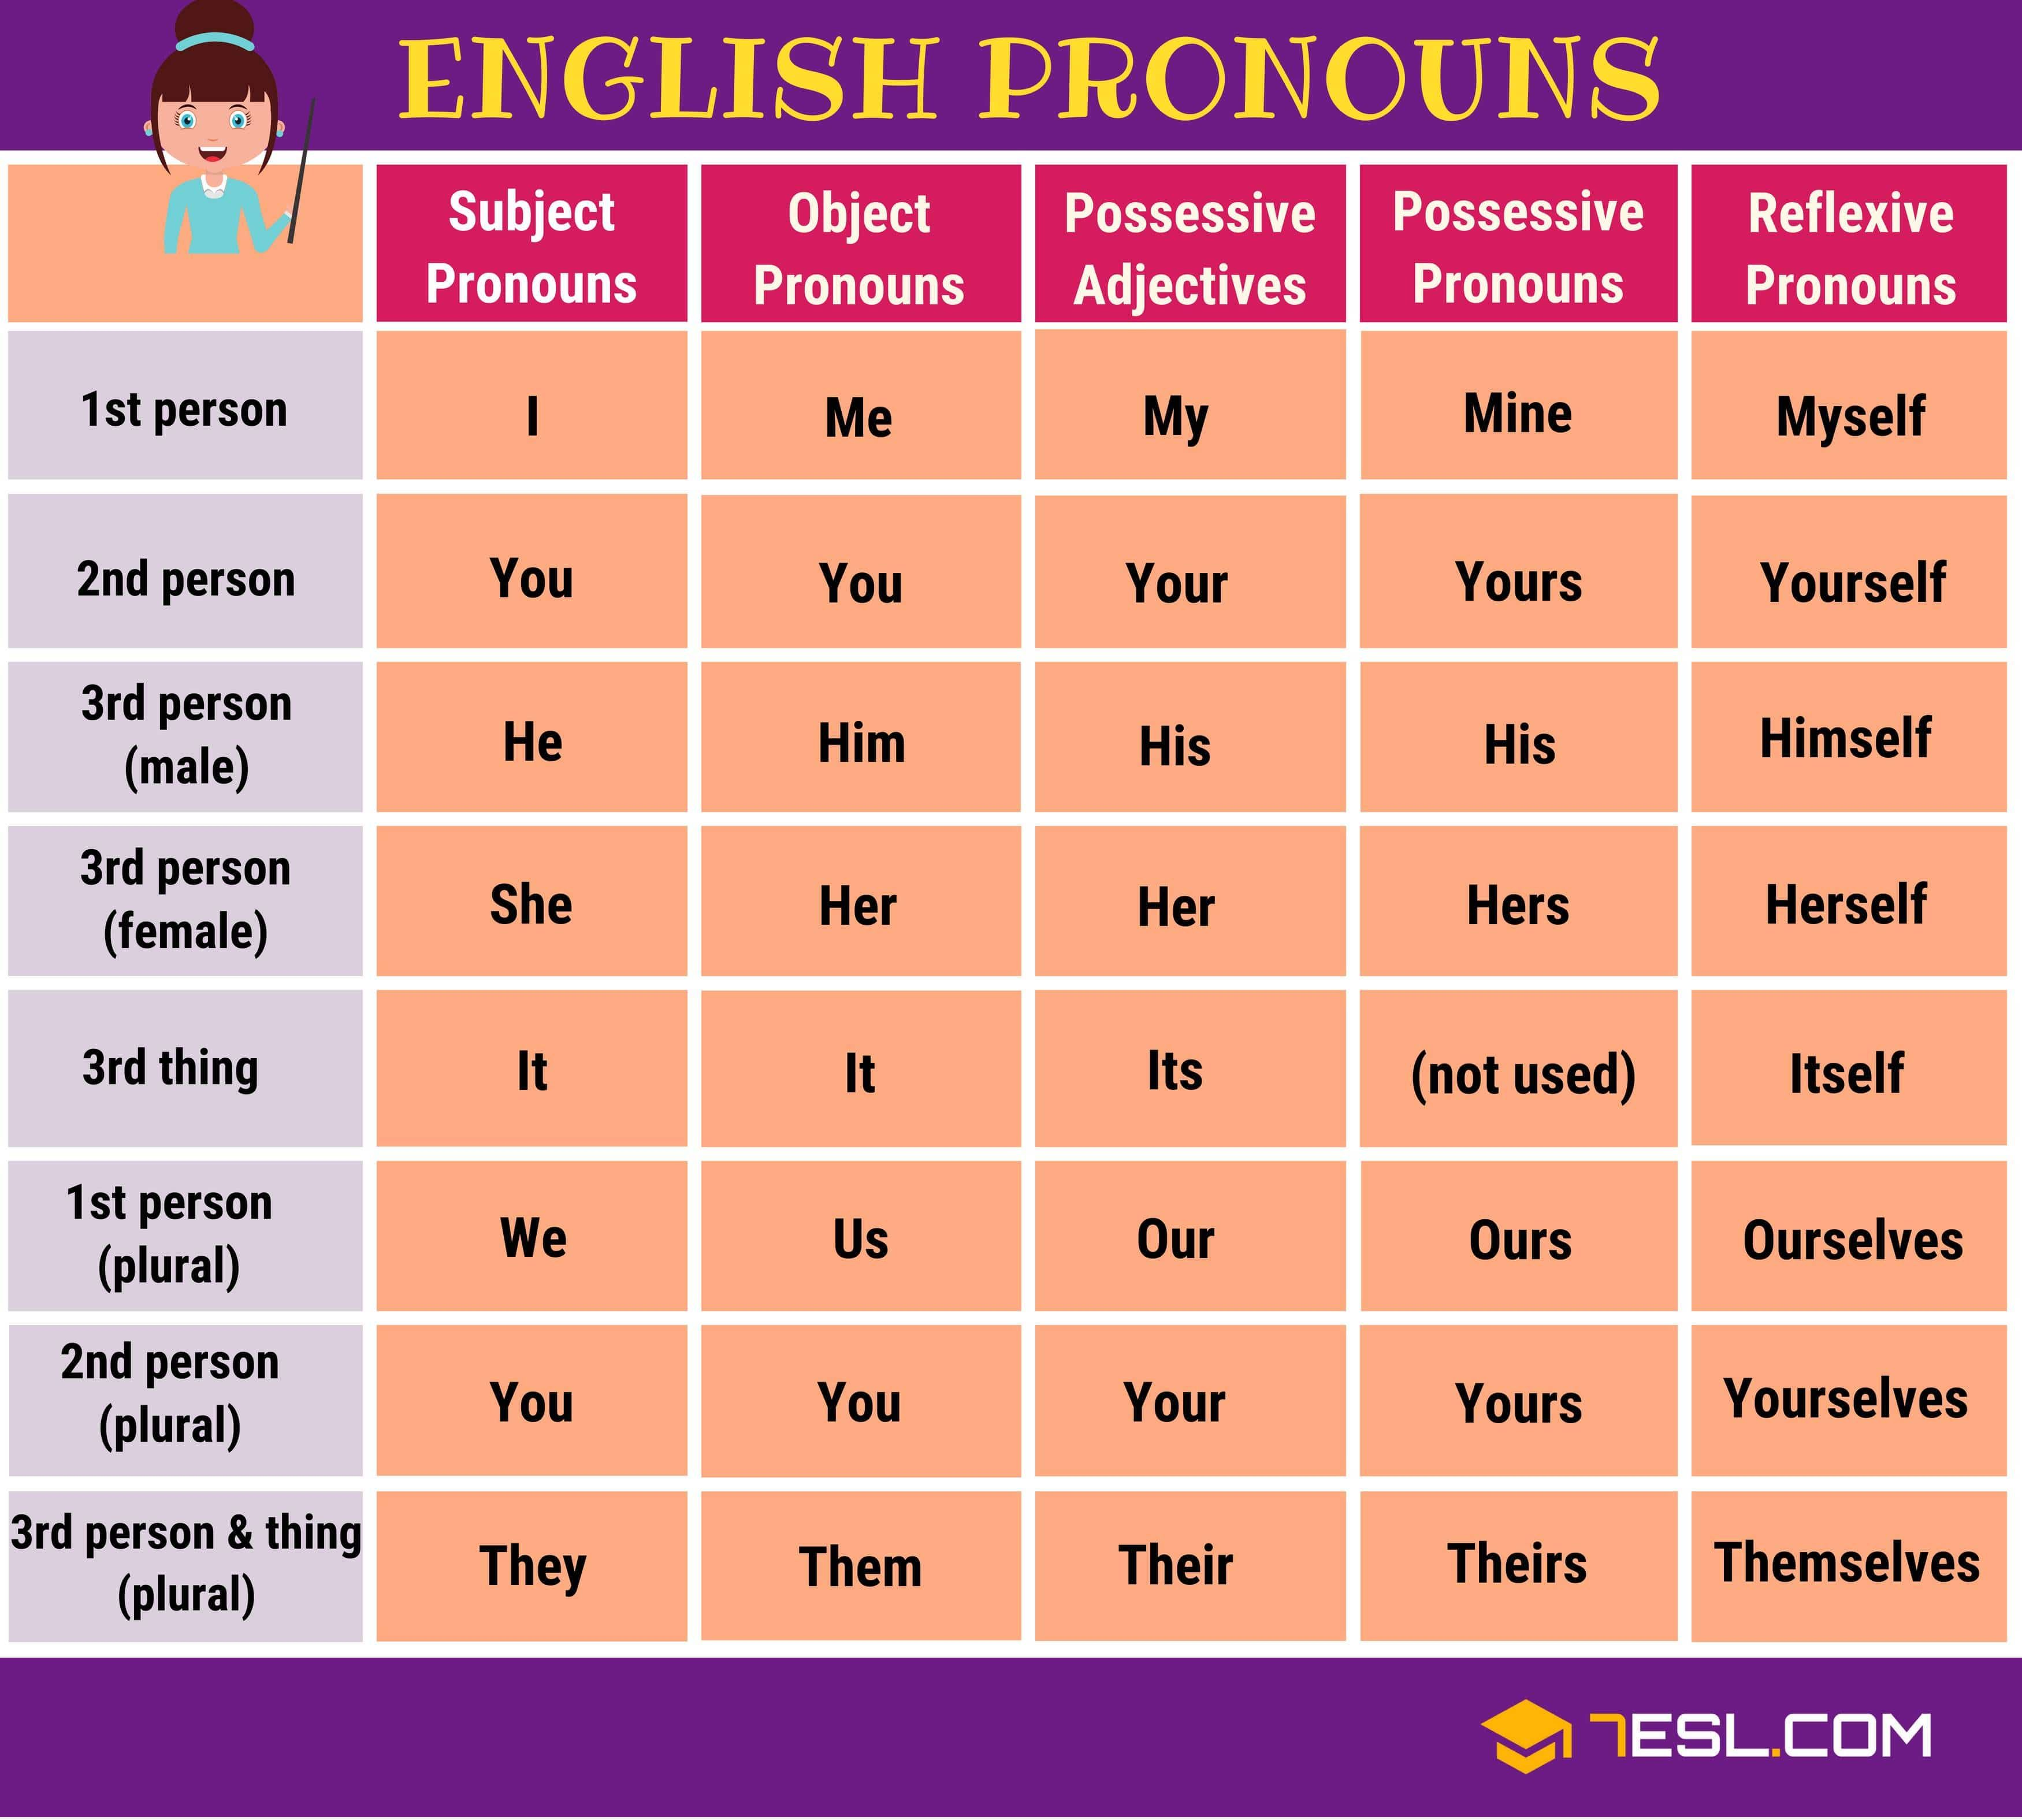 Pronoun: Definition, Rules, List Of Pronouns With Examples - 7 E S L |  English pronouns, List of pronouns, Teaching english grammar